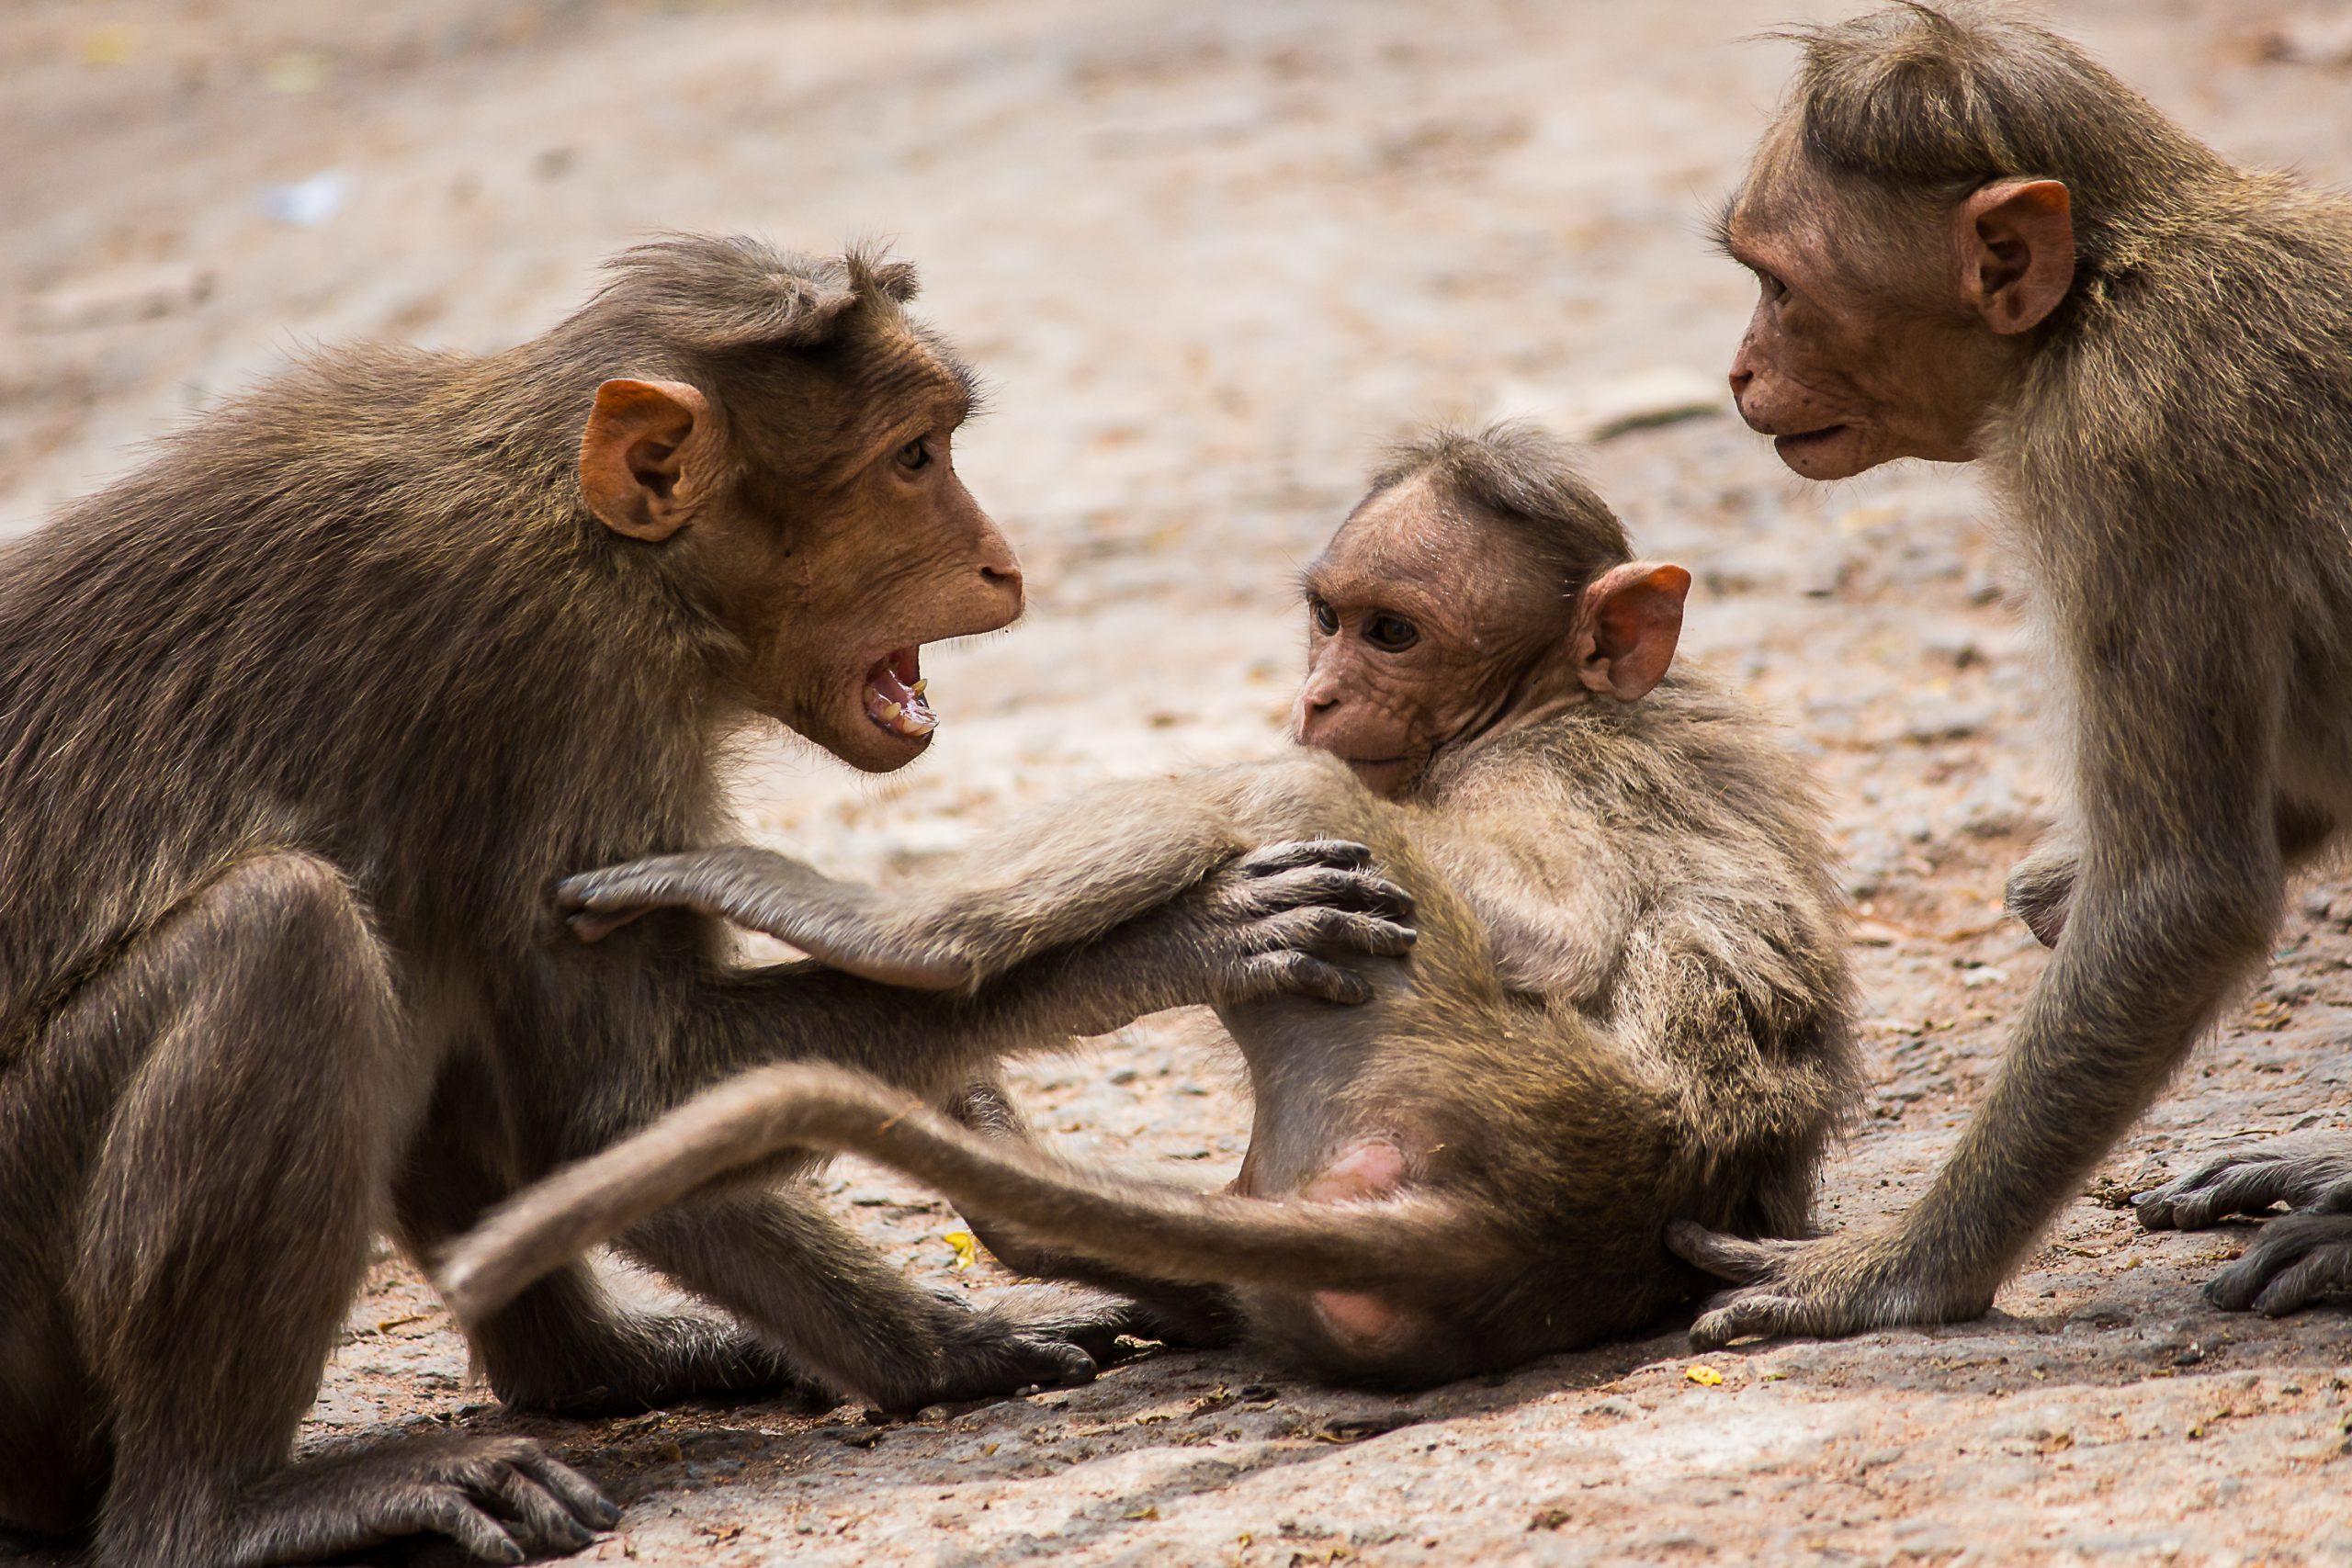 Landscape of group of monkeys